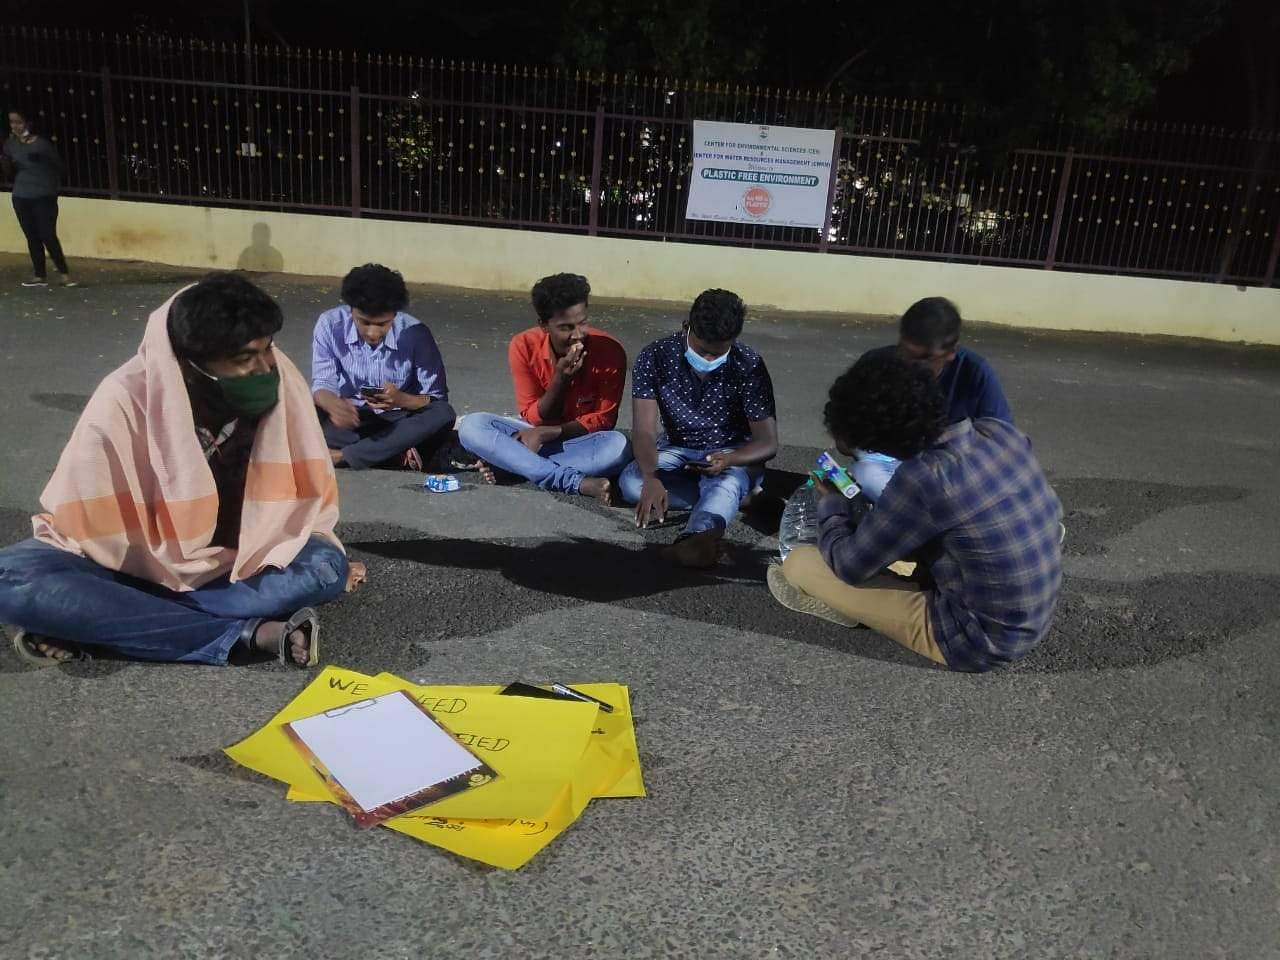 students]